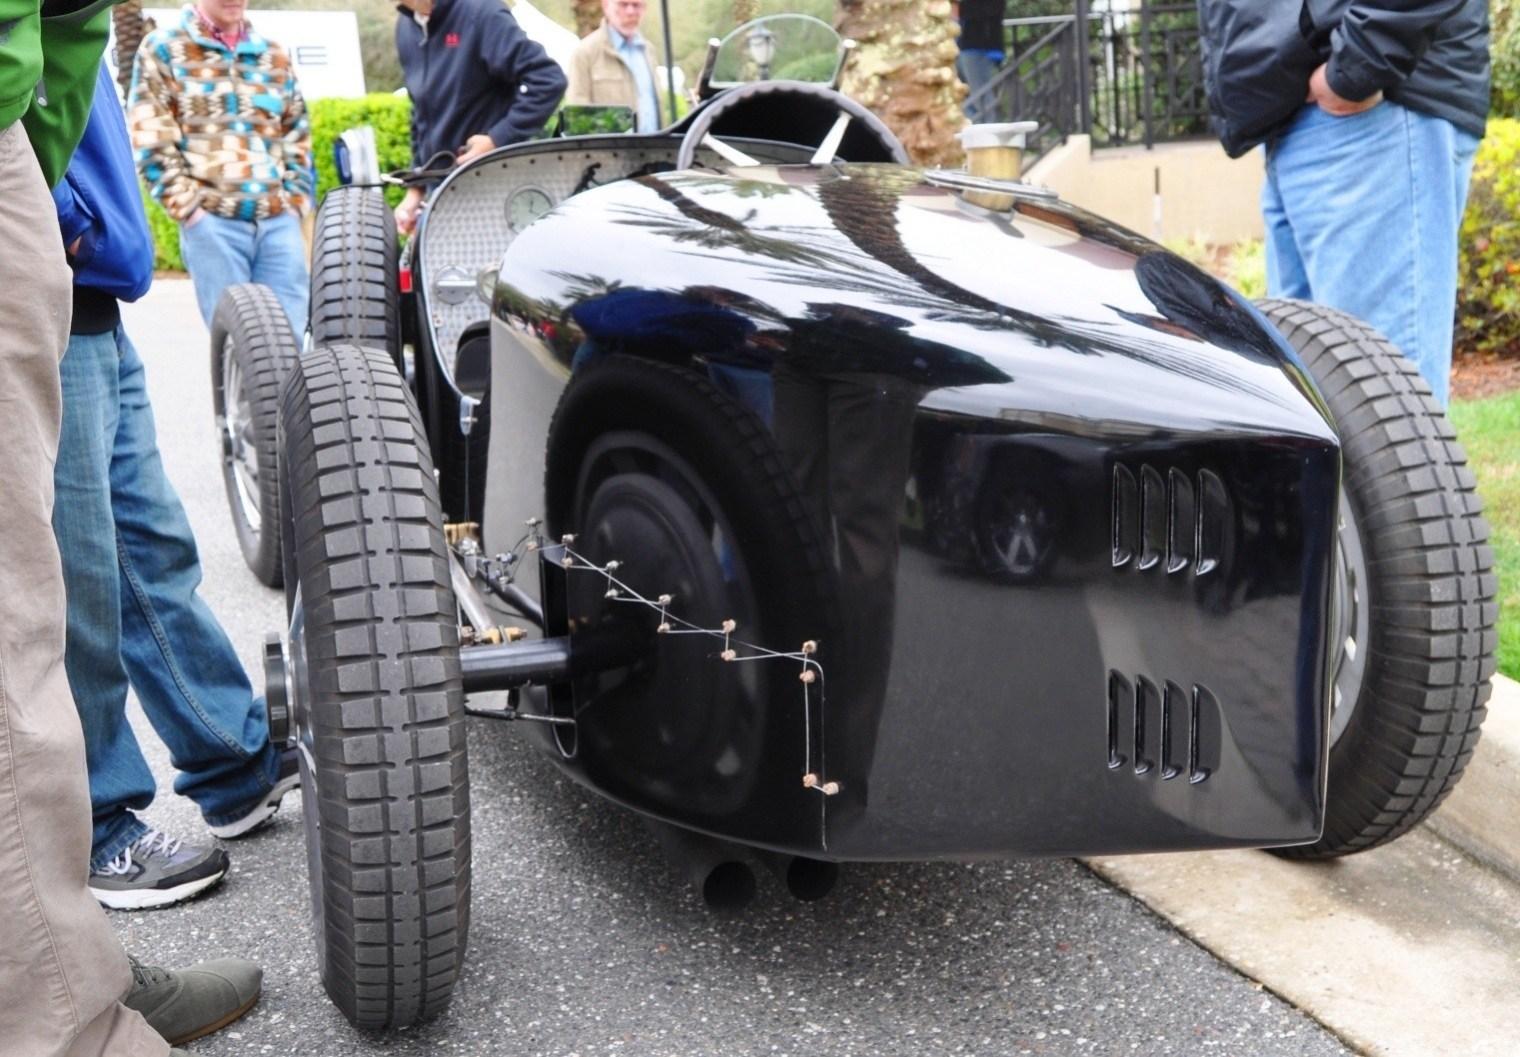 PurSang Argentina Shows Innovative Marketing with Street-Parked 1920s Bugatti GP Car16